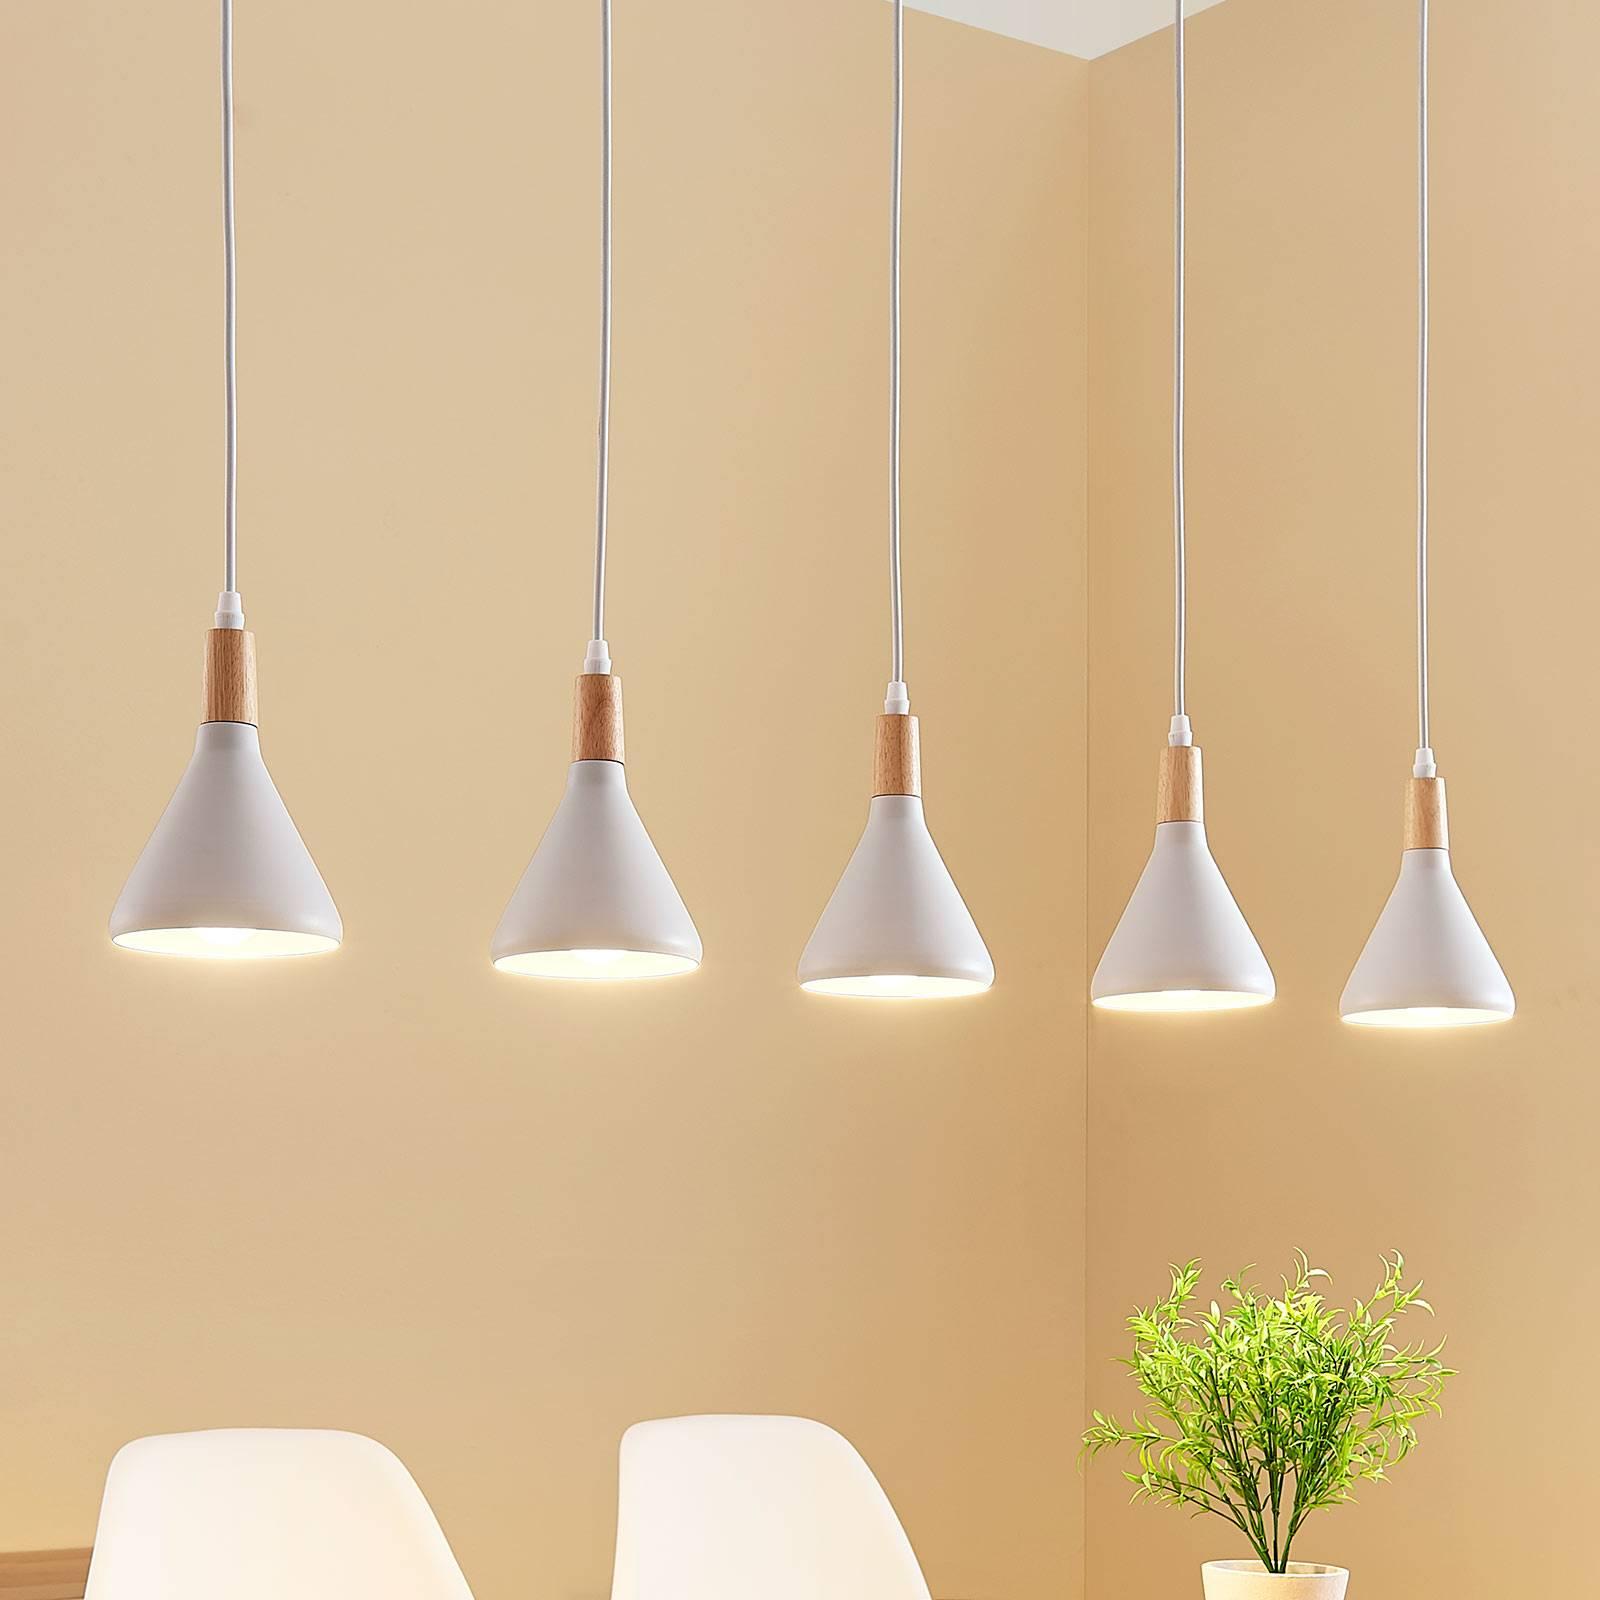 Fraaie LED wandlamp Arina in wit met 5 lampen